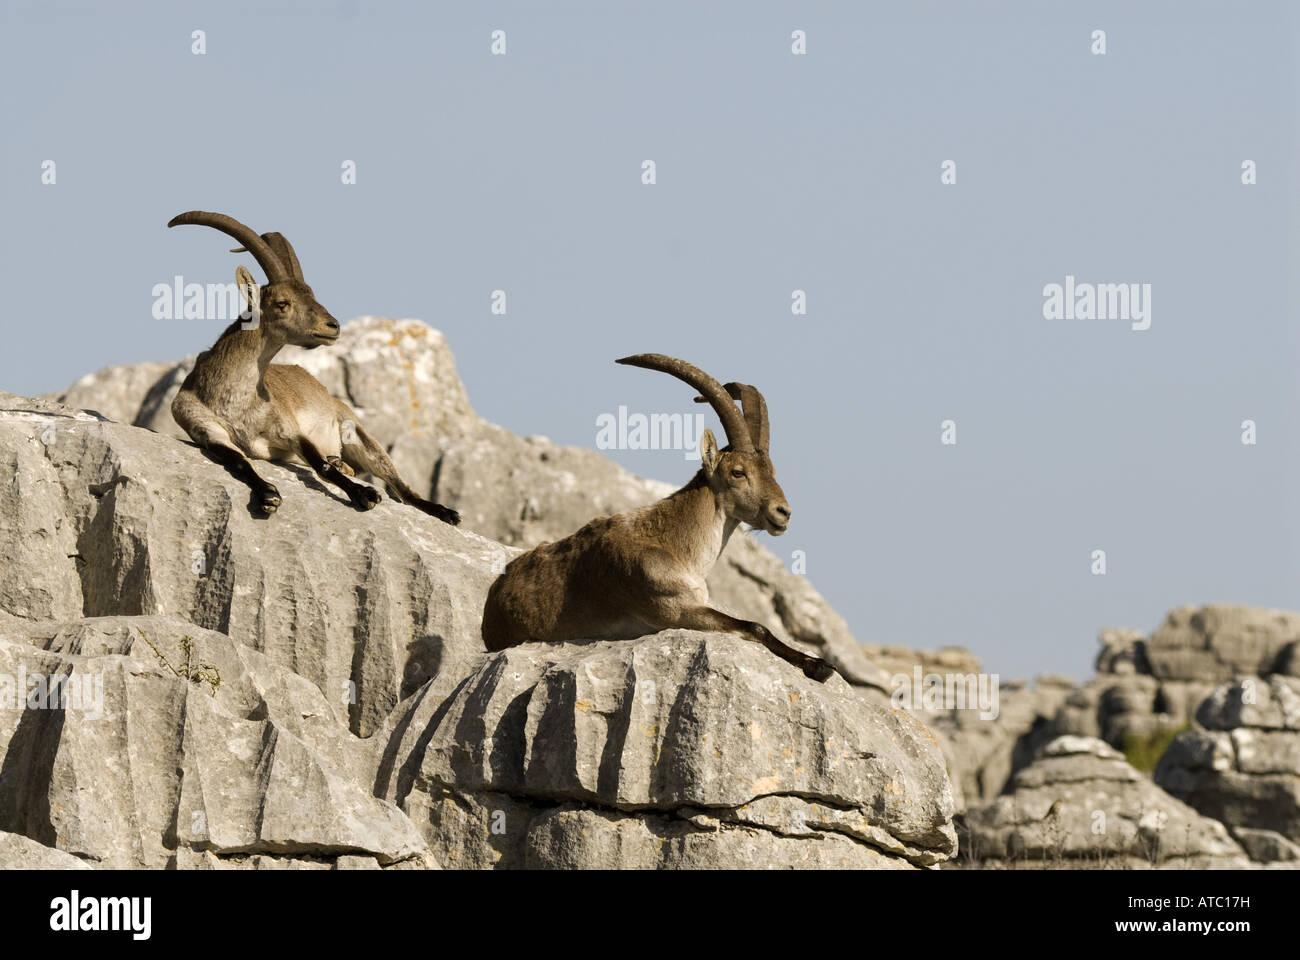 Rocks In Spanish Part - 18: Iberian Ibex, Spanish Ibex (Capra Pyrenaica), Two Individuals Resting On Rocks  In The Sun, Spain, Andalusia, Naturschutzgebiet